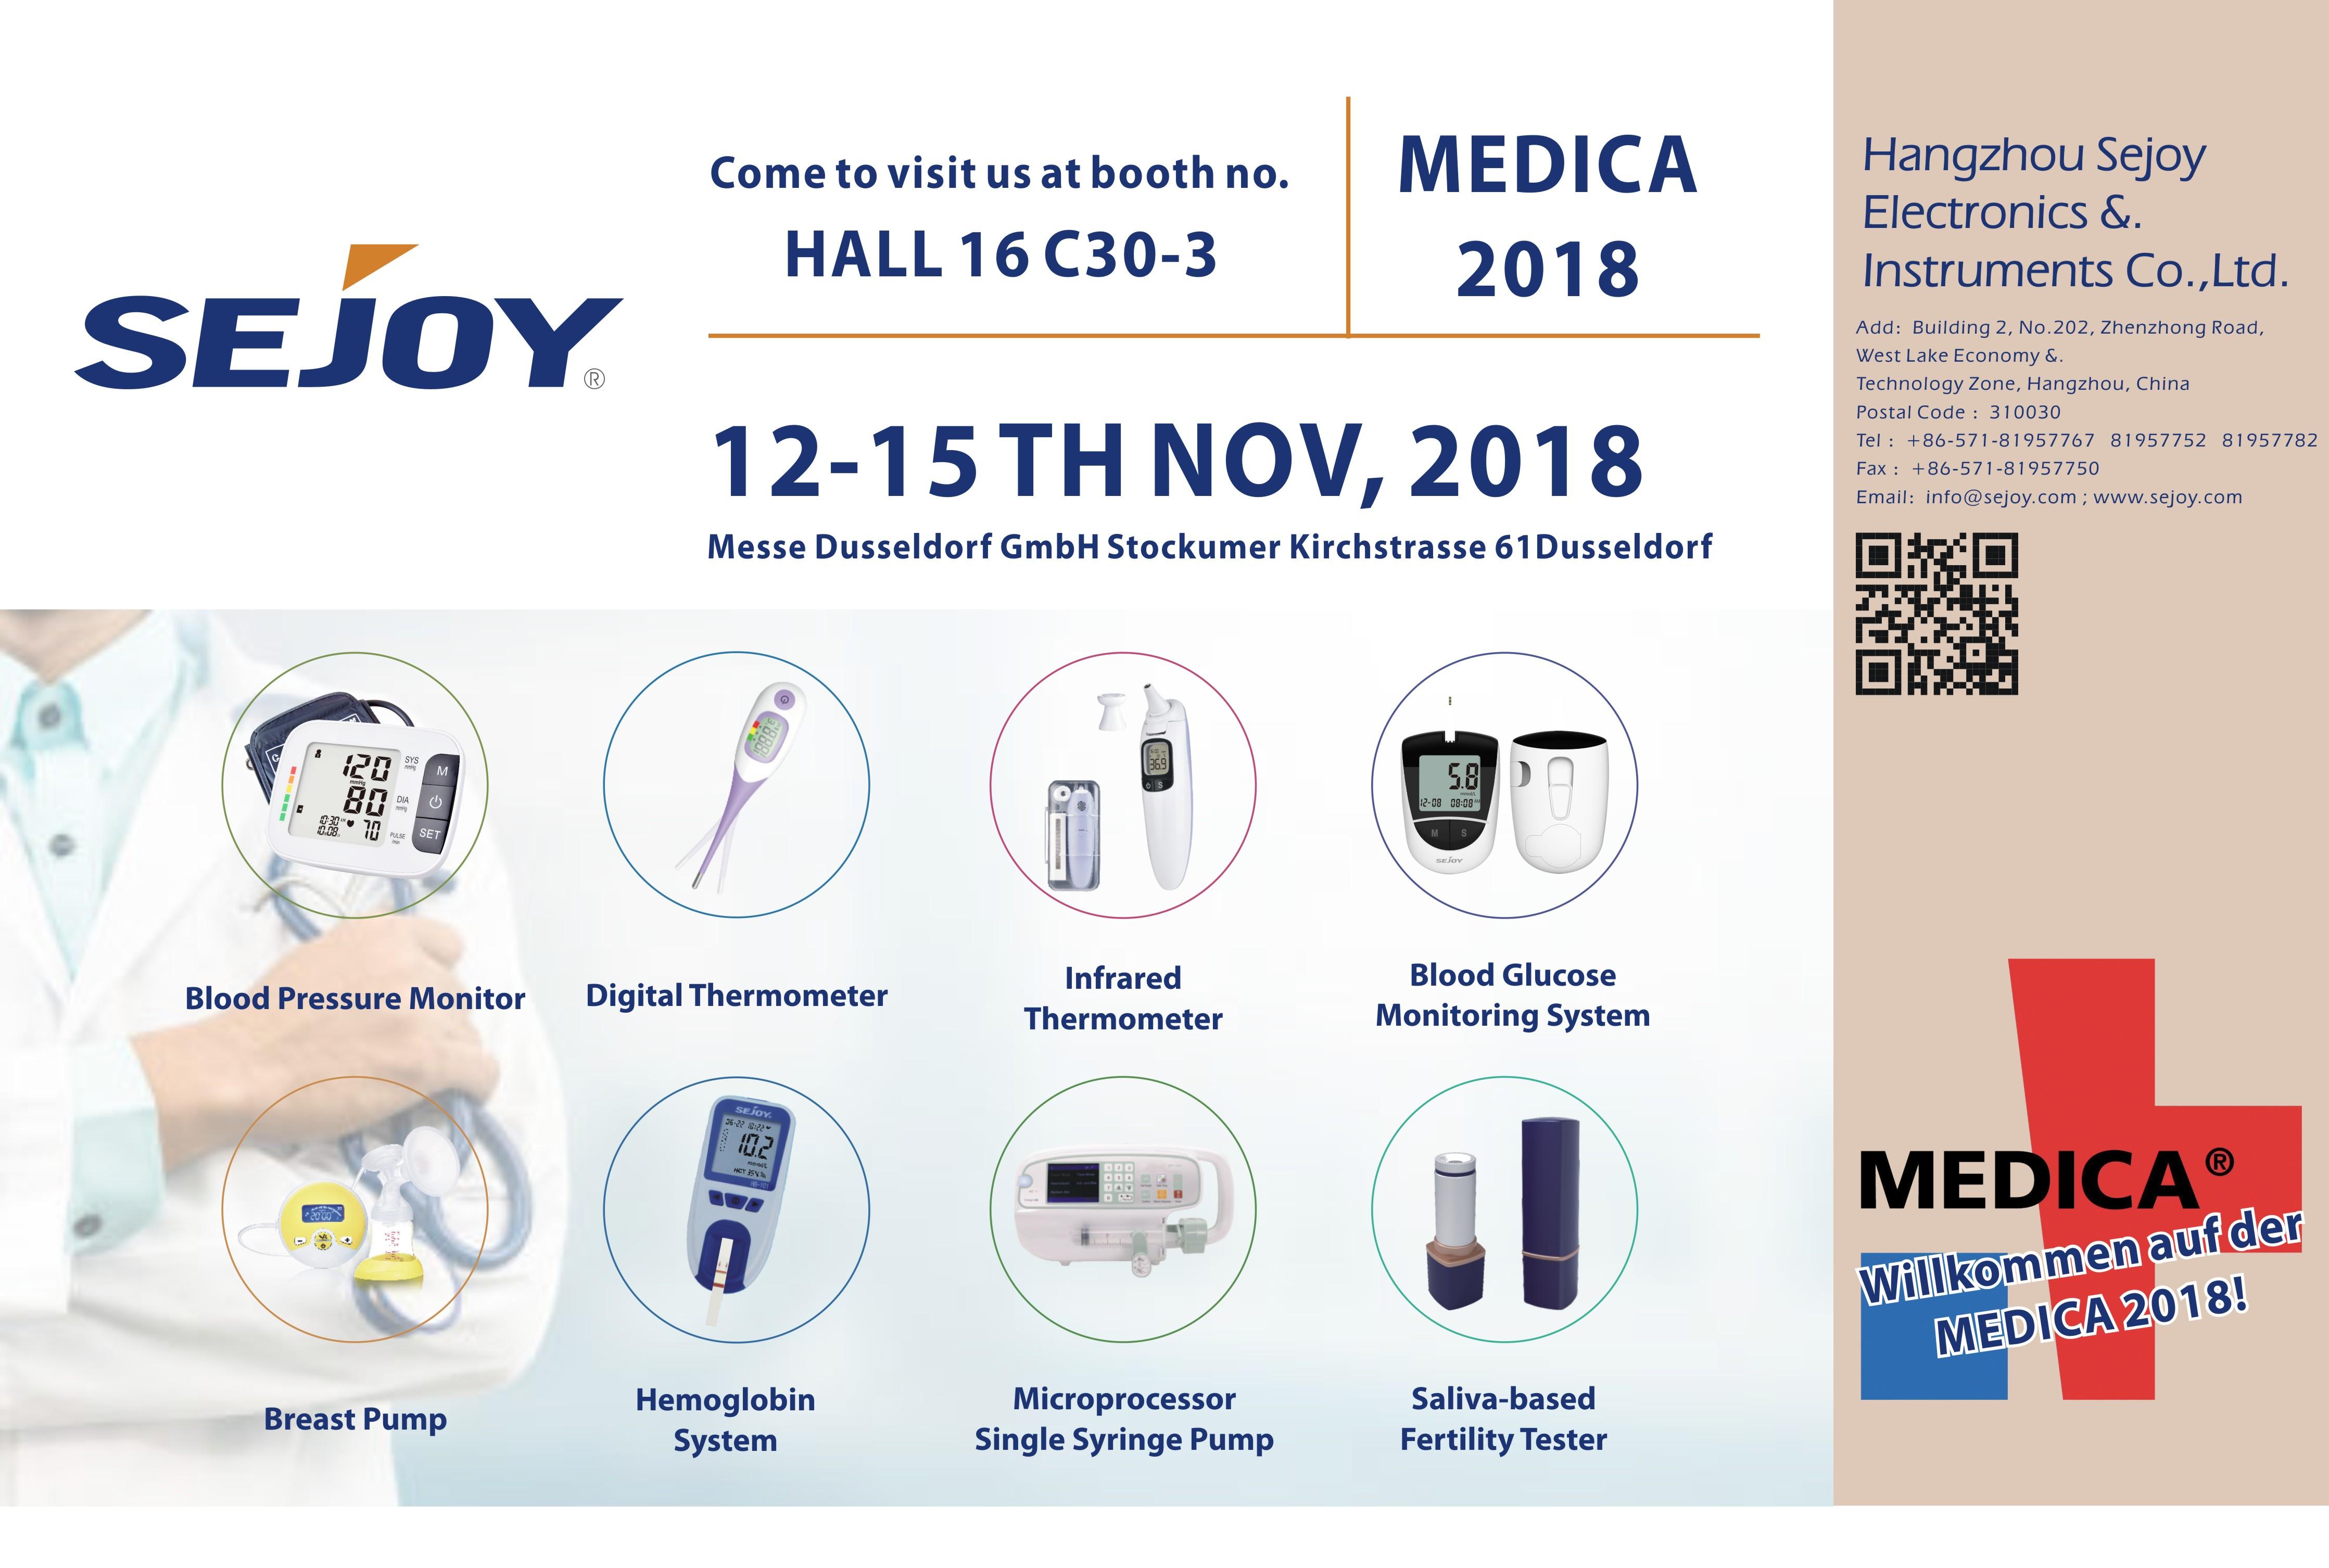 2018 MEDICA Invitation Booth#Hall 16C30 -3